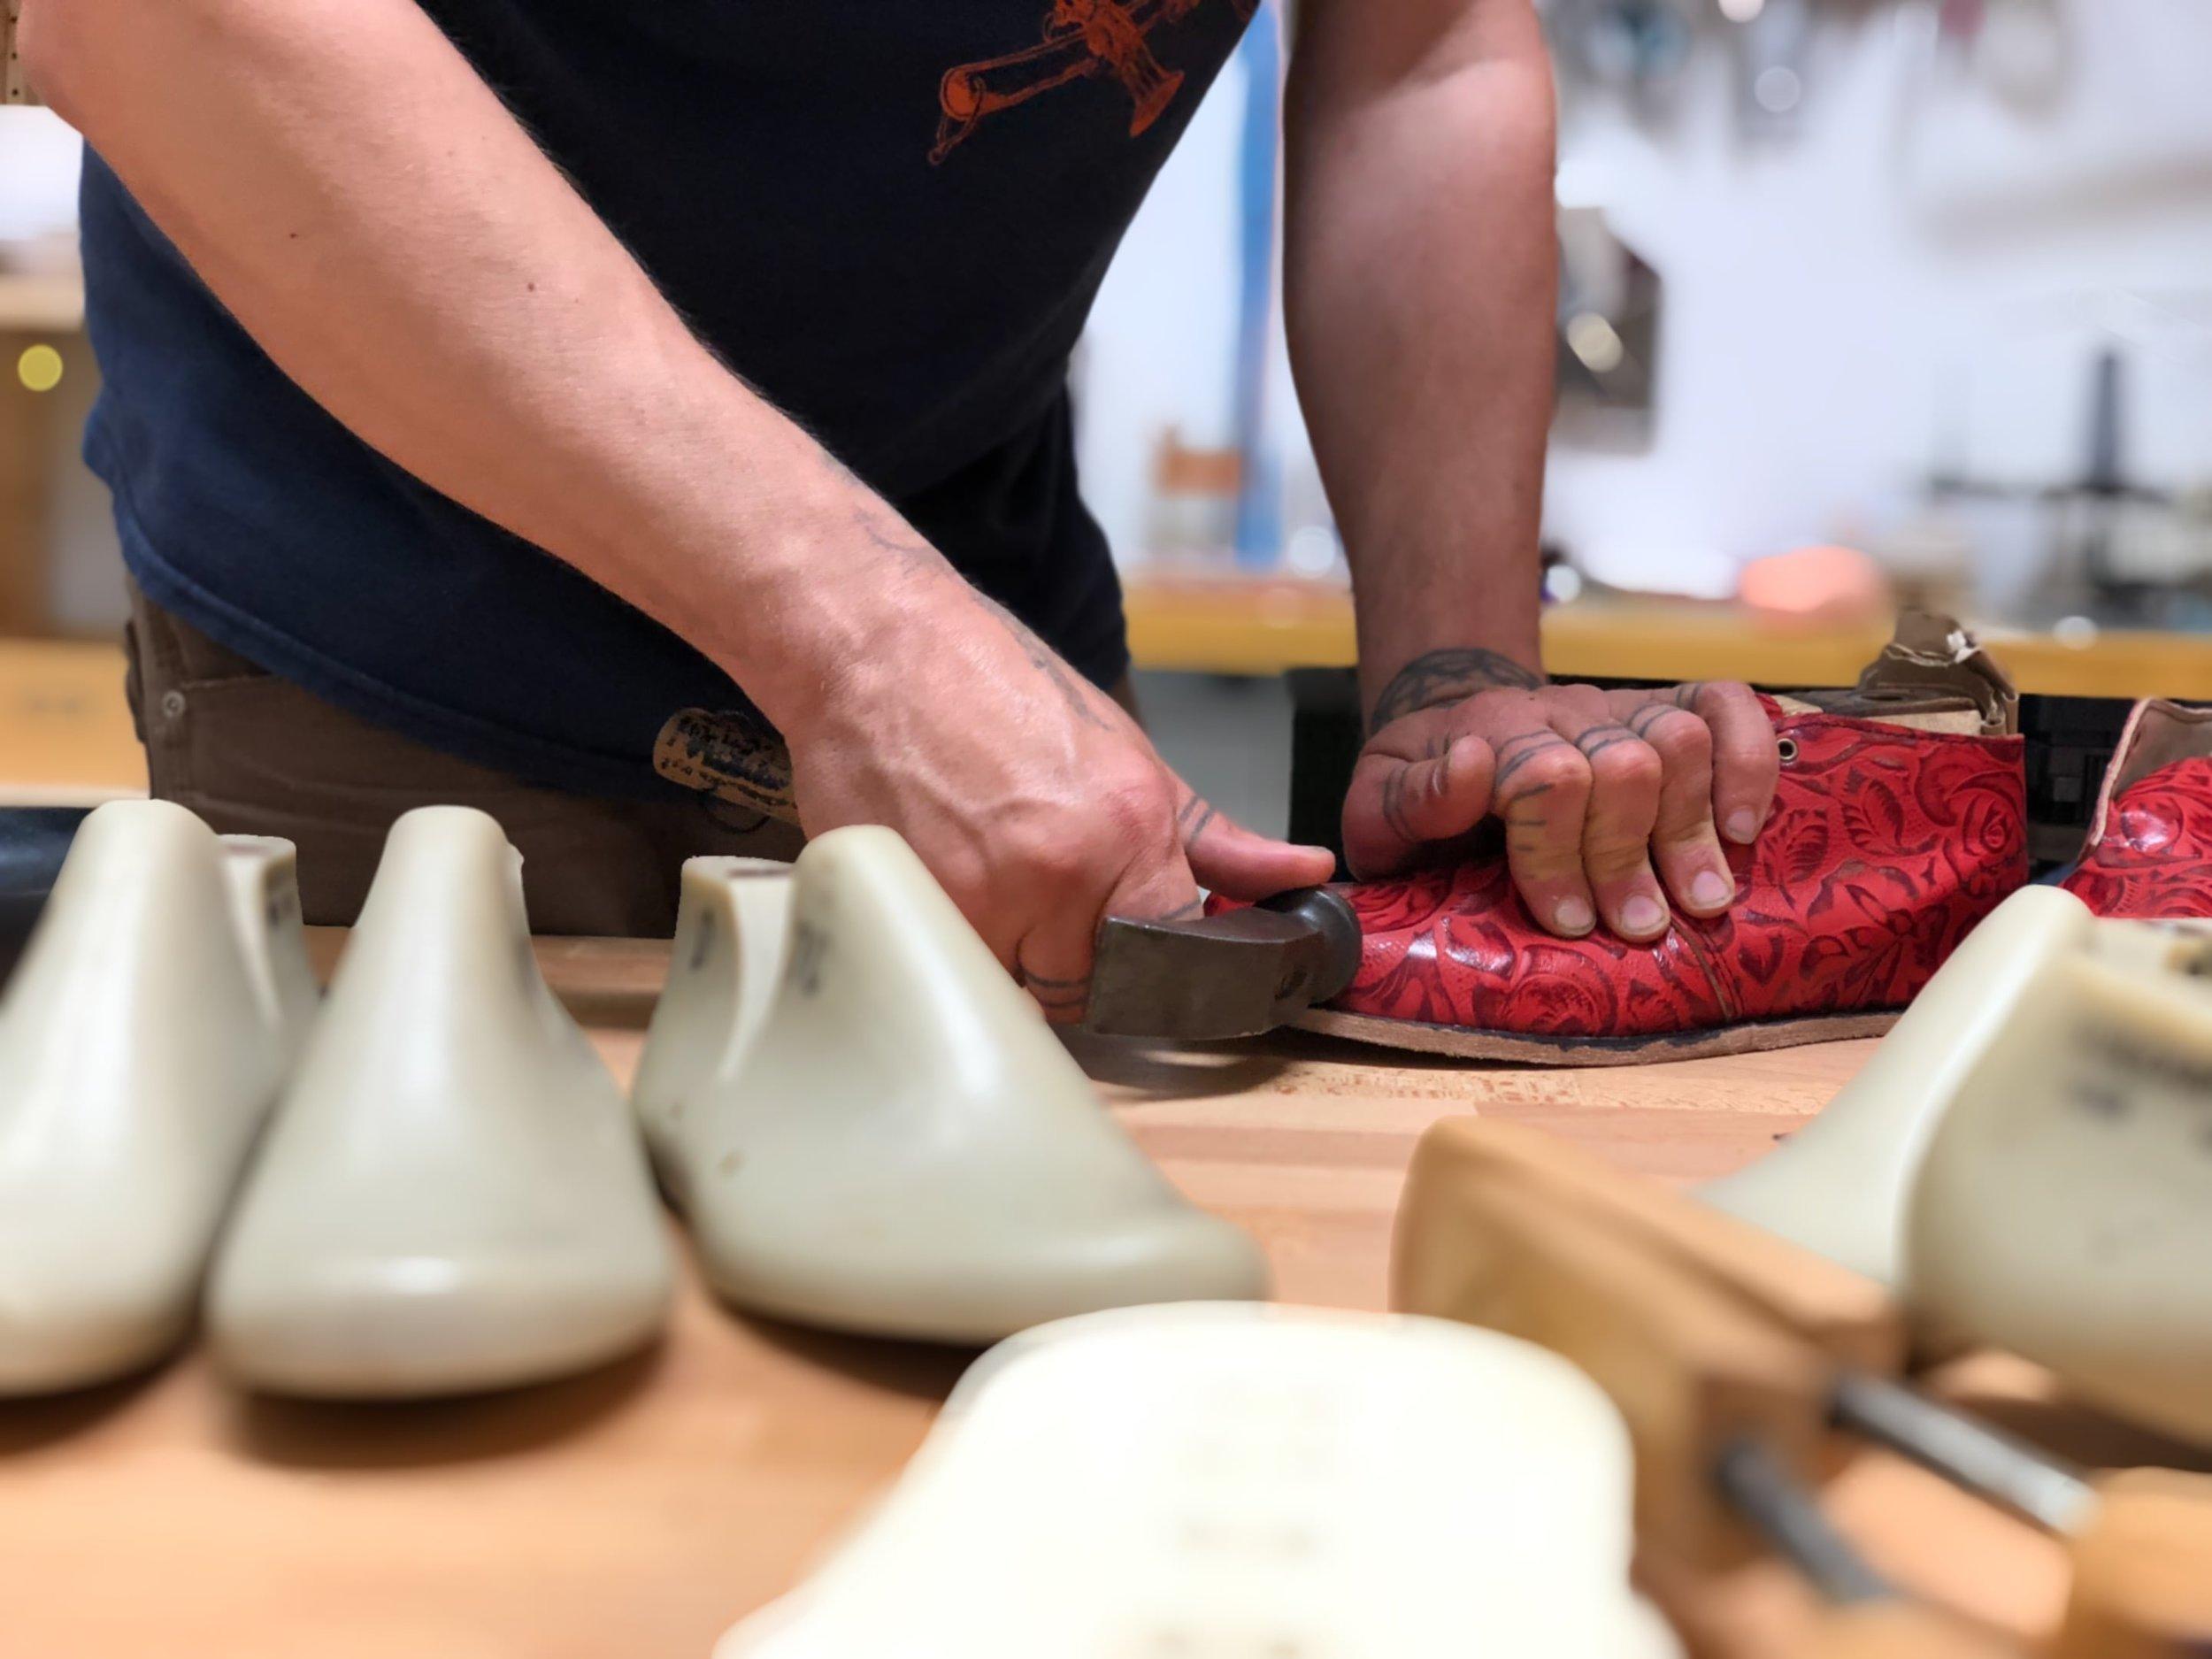 shoemaking-7-min.JPG